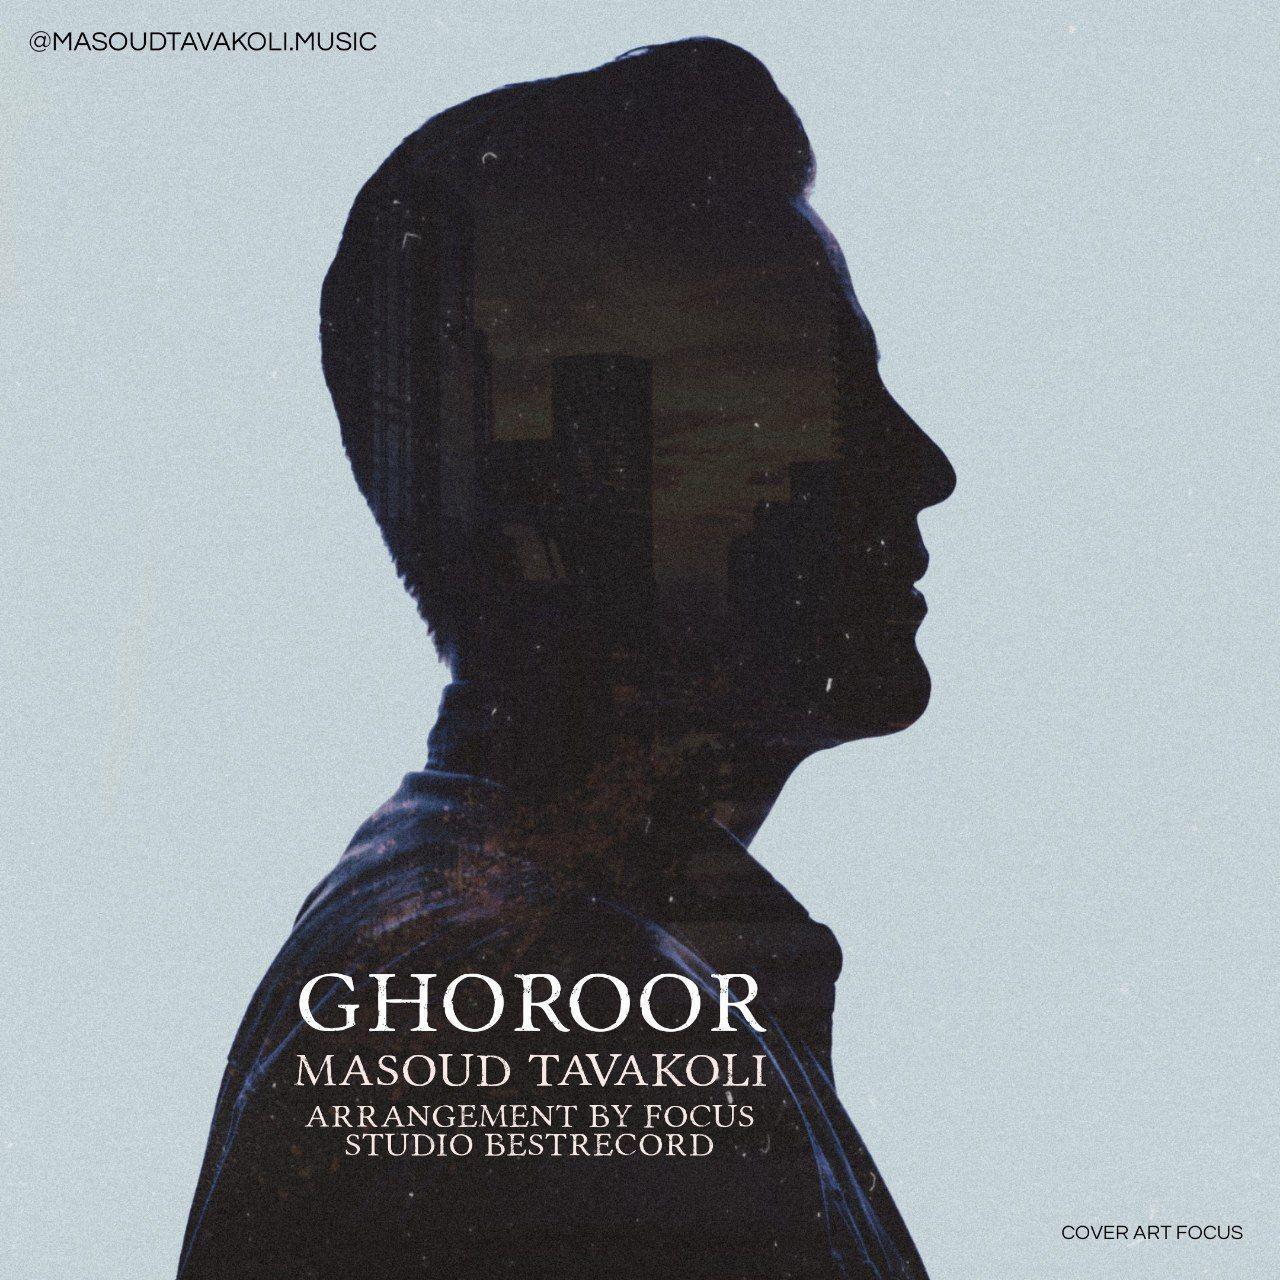 Masoud Tavakoli – Ghoroor